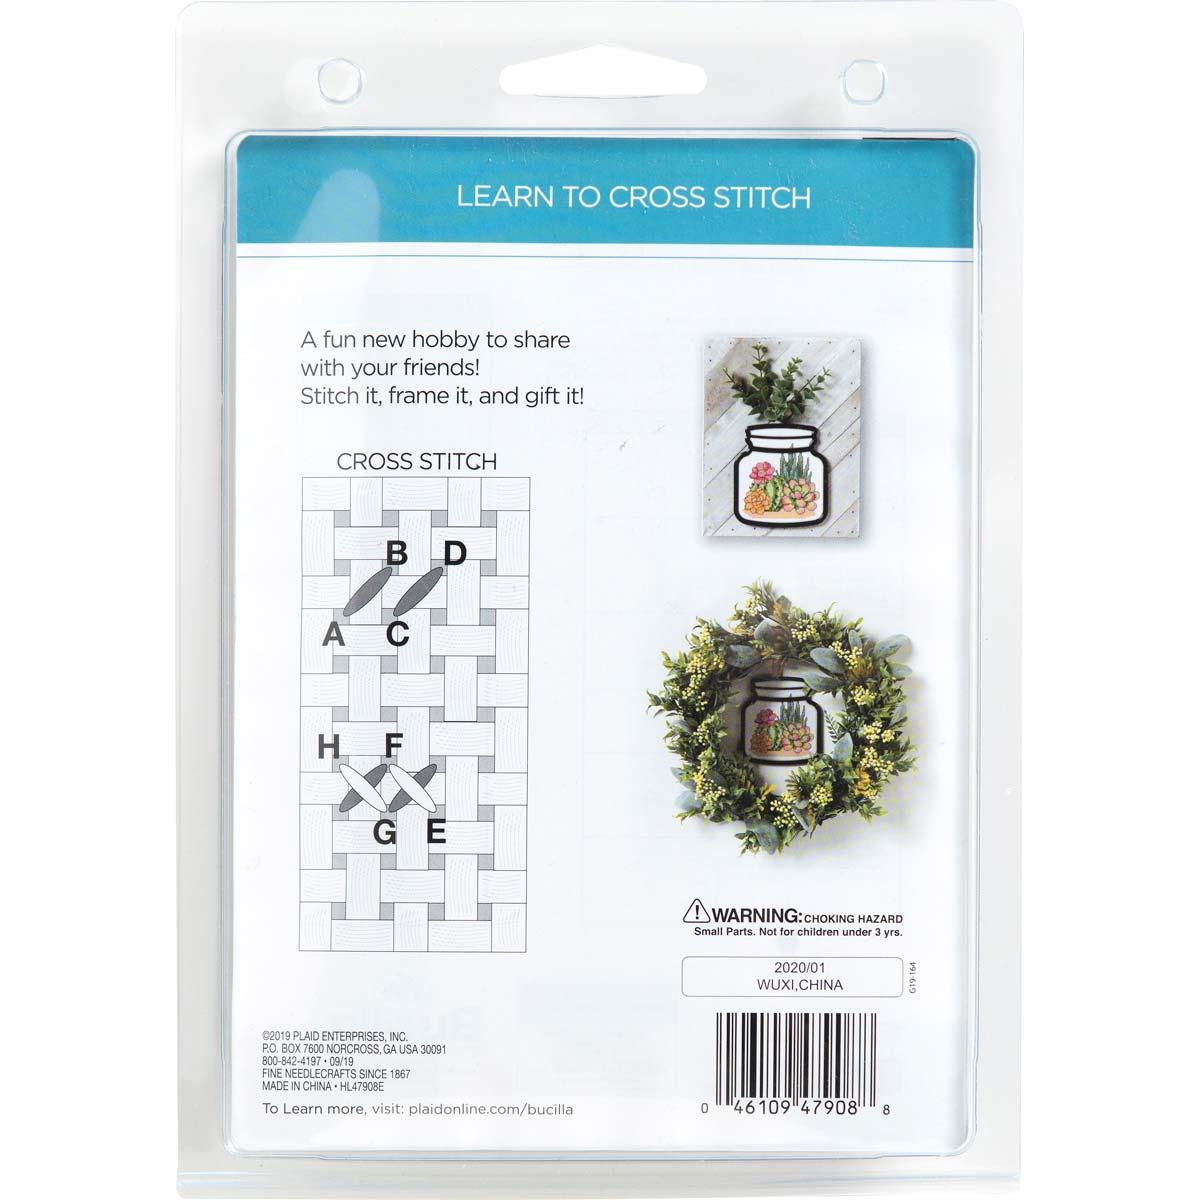 Bucilla ® My 1st Stitch™ - Counted Cross Stitch Kits - Terrarium Frame - Cactus - 47908E